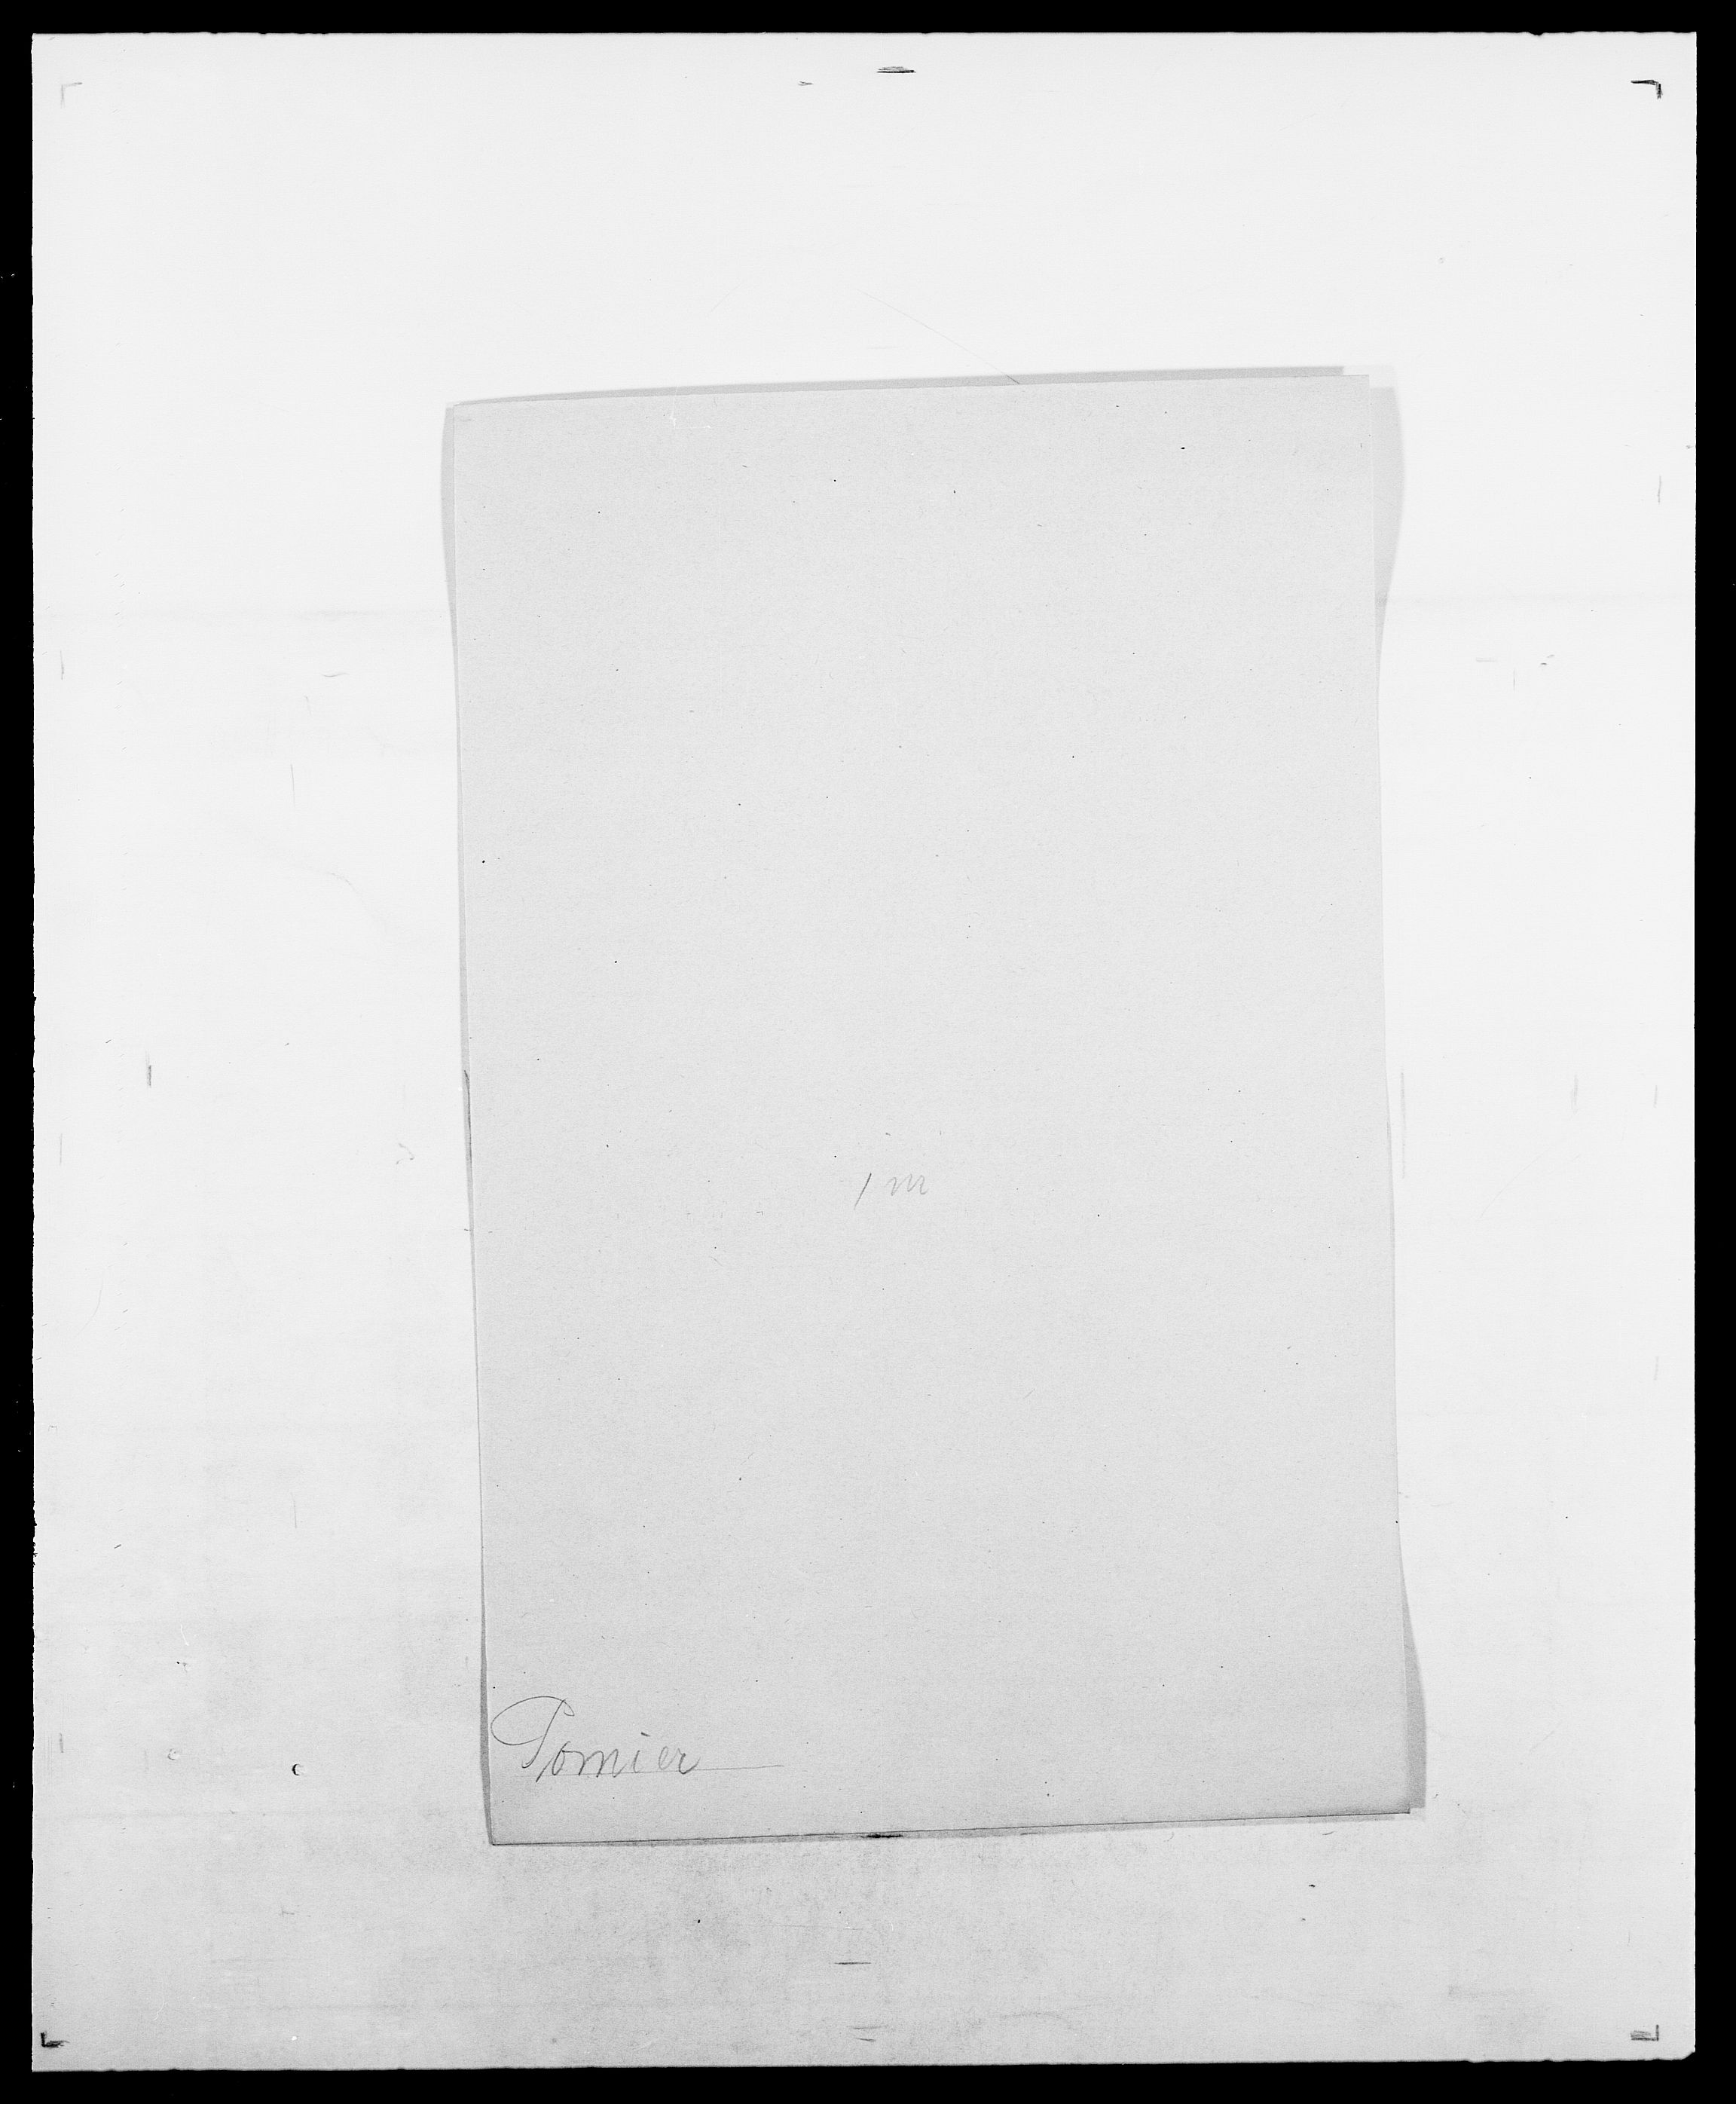 SAO, Delgobe, Charles Antoine - samling, D/Da/L0031: de Place - Raaum, s. 200